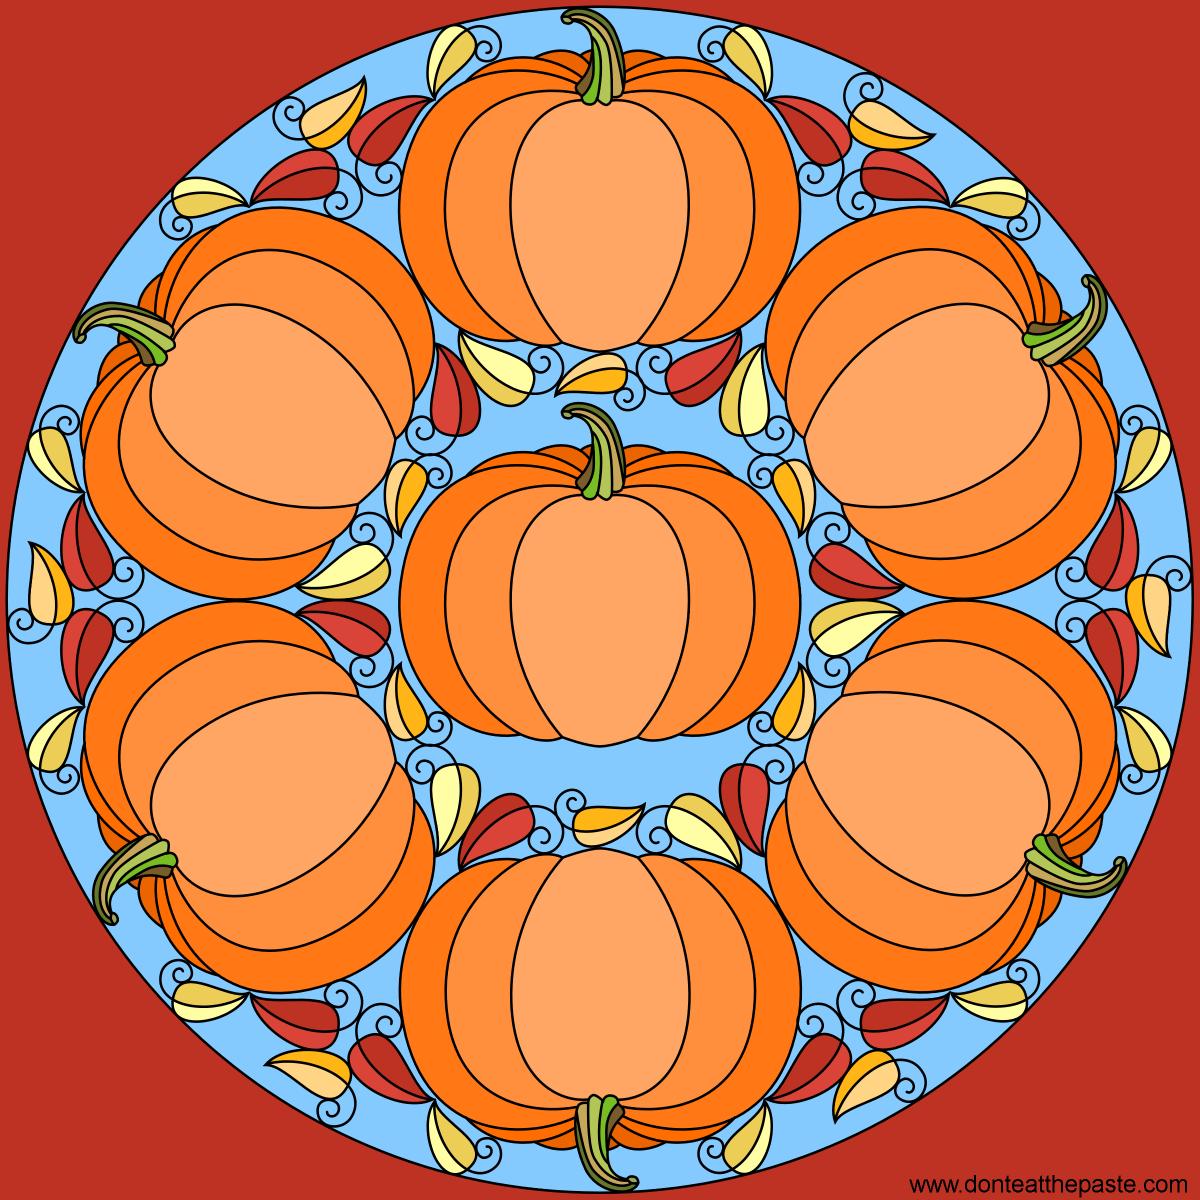 Don't Eat the Paste: Pumpkin Mandala- Happy Autumn!